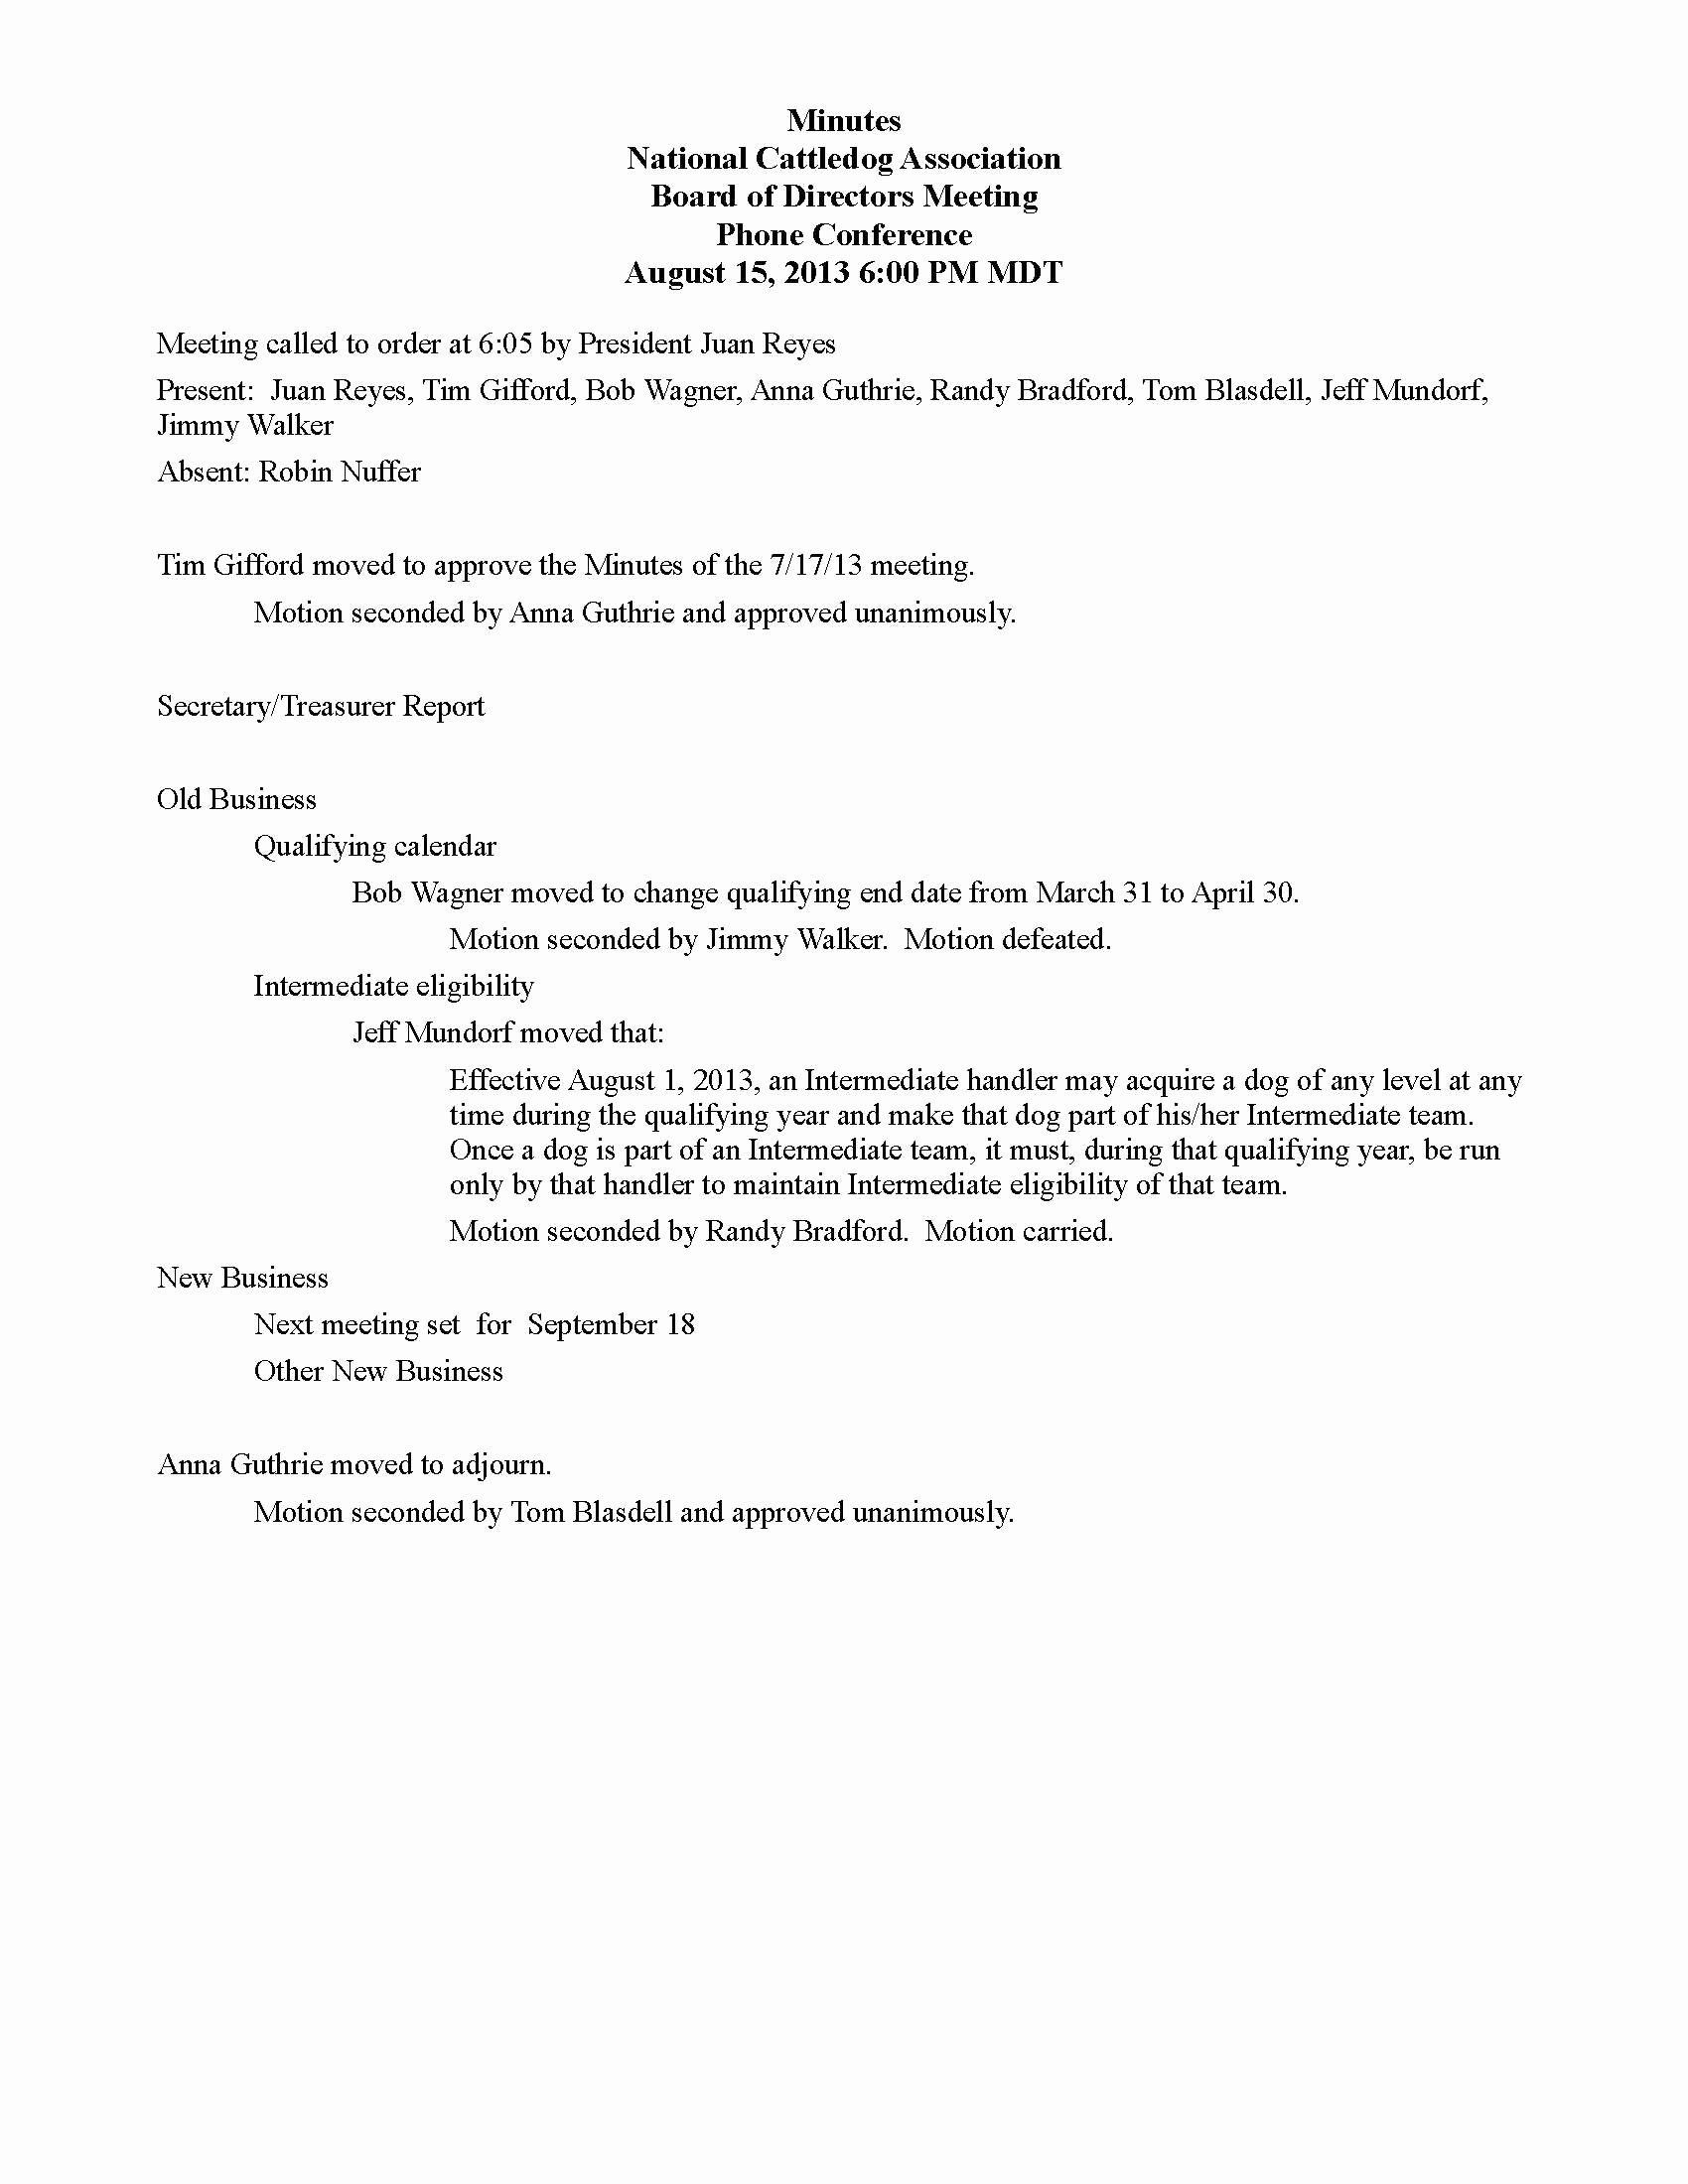 Printable Hoa Meeting Minutes Template Heartwork Annual Board Meeting Agenda Template Excel Meeting Agenda Template Meeting Agenda Agenda Template